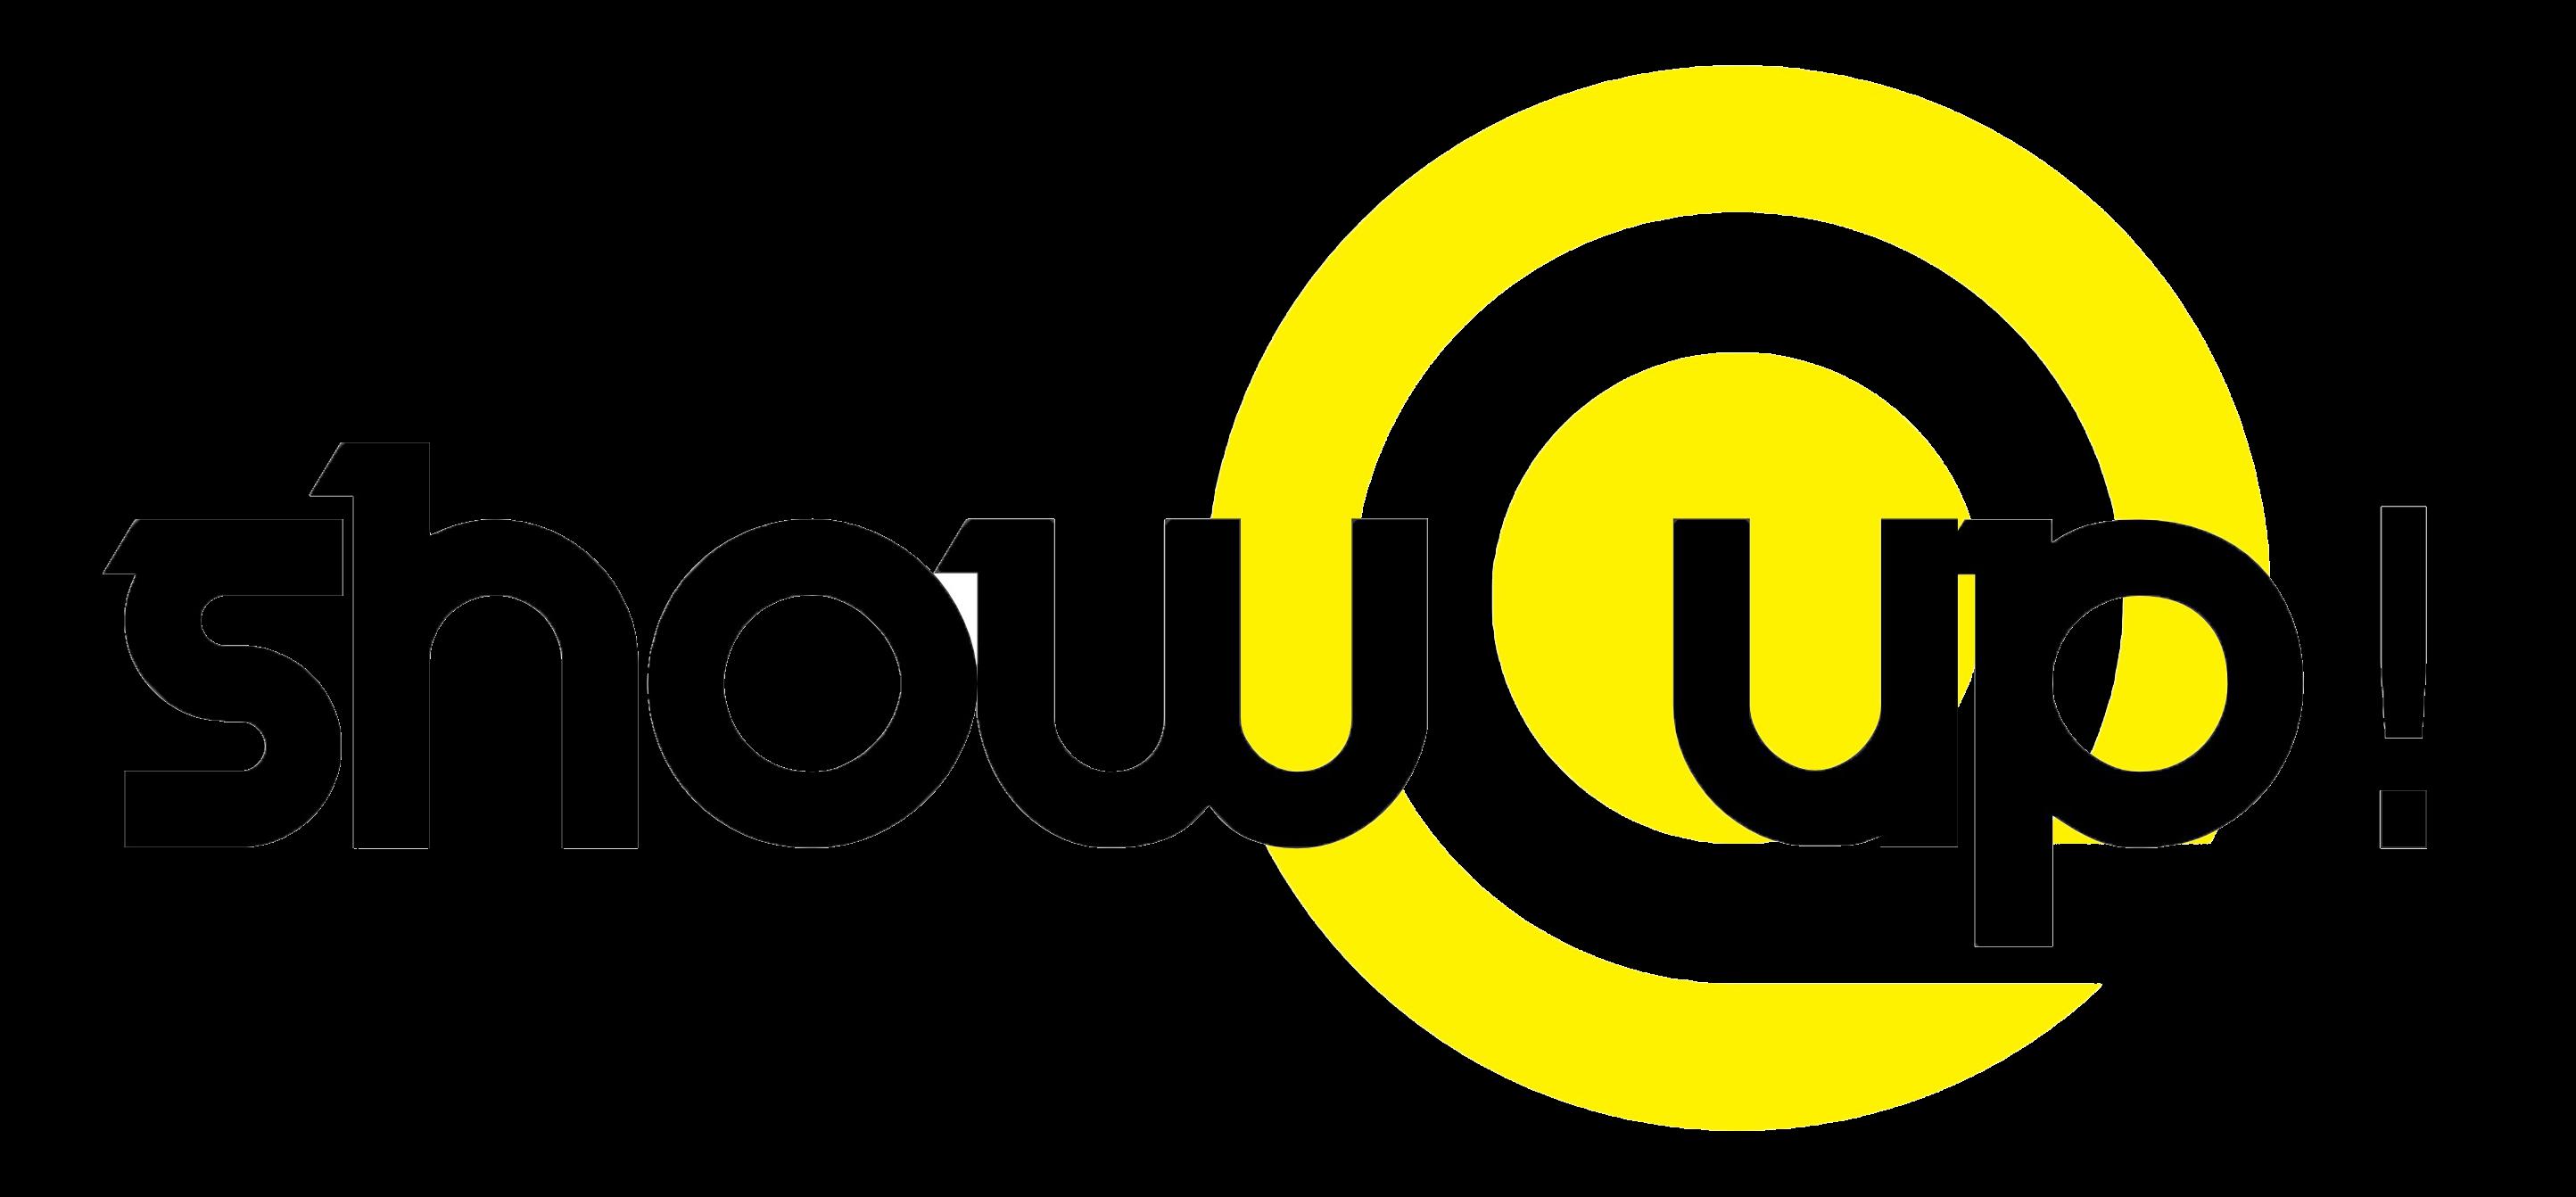 cropped-logo-giusto-trasparente-png.png